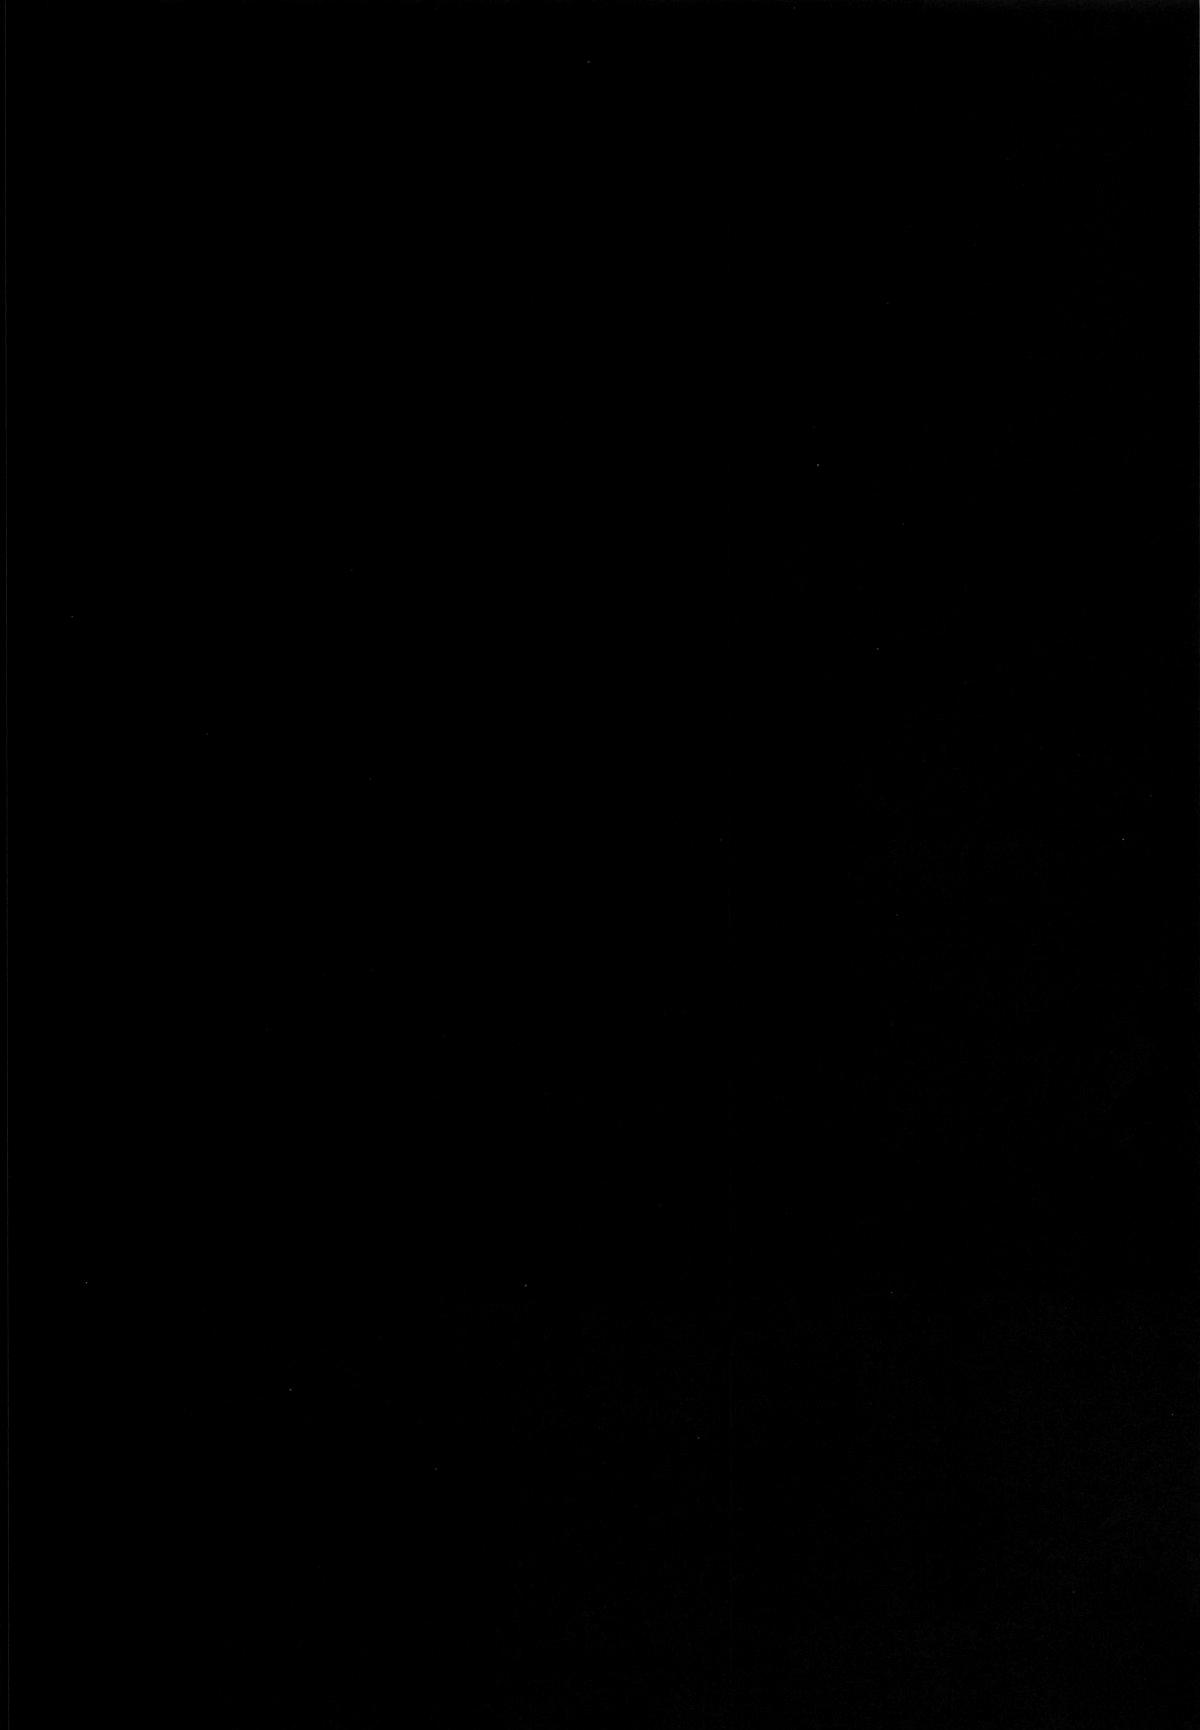 [Waffle Doumeiken (Tanaka Decilitre)] Inmon Megumin - Crotch Tattoo Megumin! (Kono Subarashii Sekai ni Syukufuku o!) [Chinese] [海市个人汉化]] 3